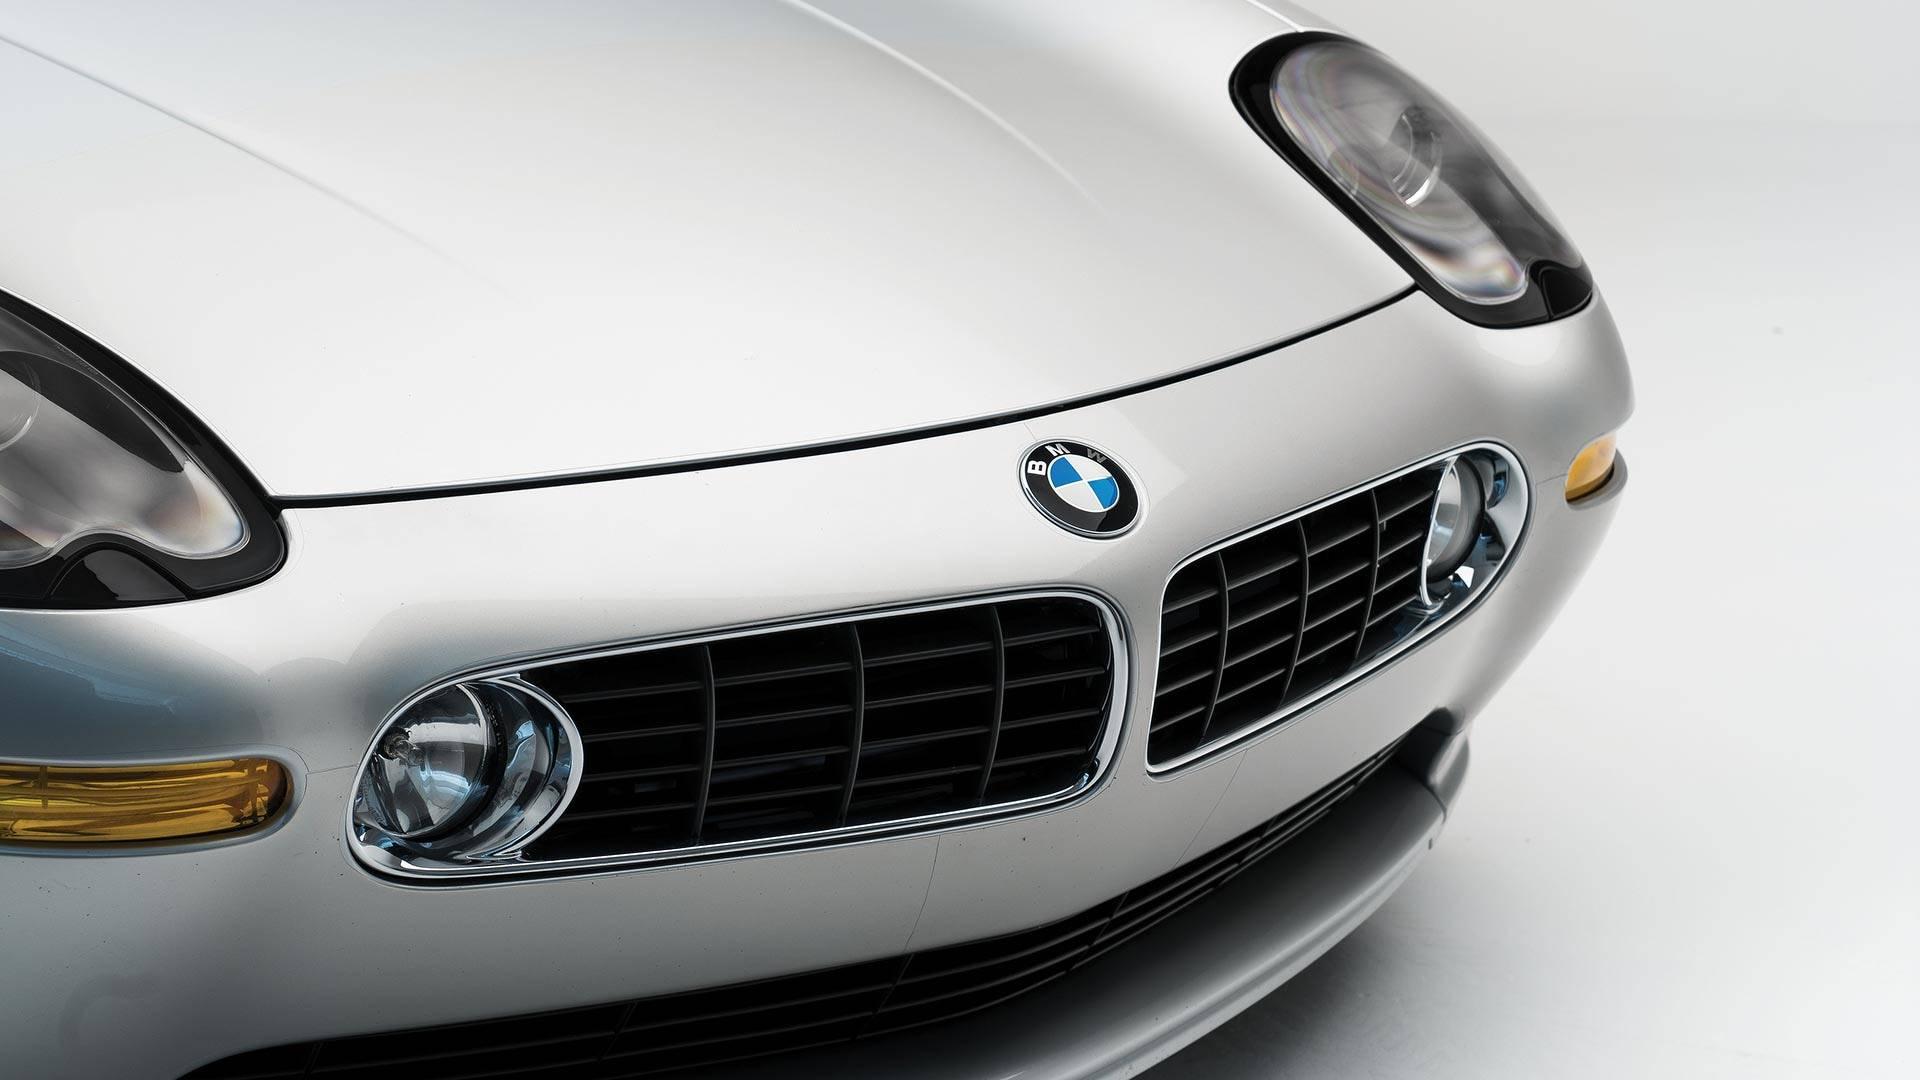 Успевай приобрести – BMW Z8 2000 Стива Джобса будет выставлен на аукционе